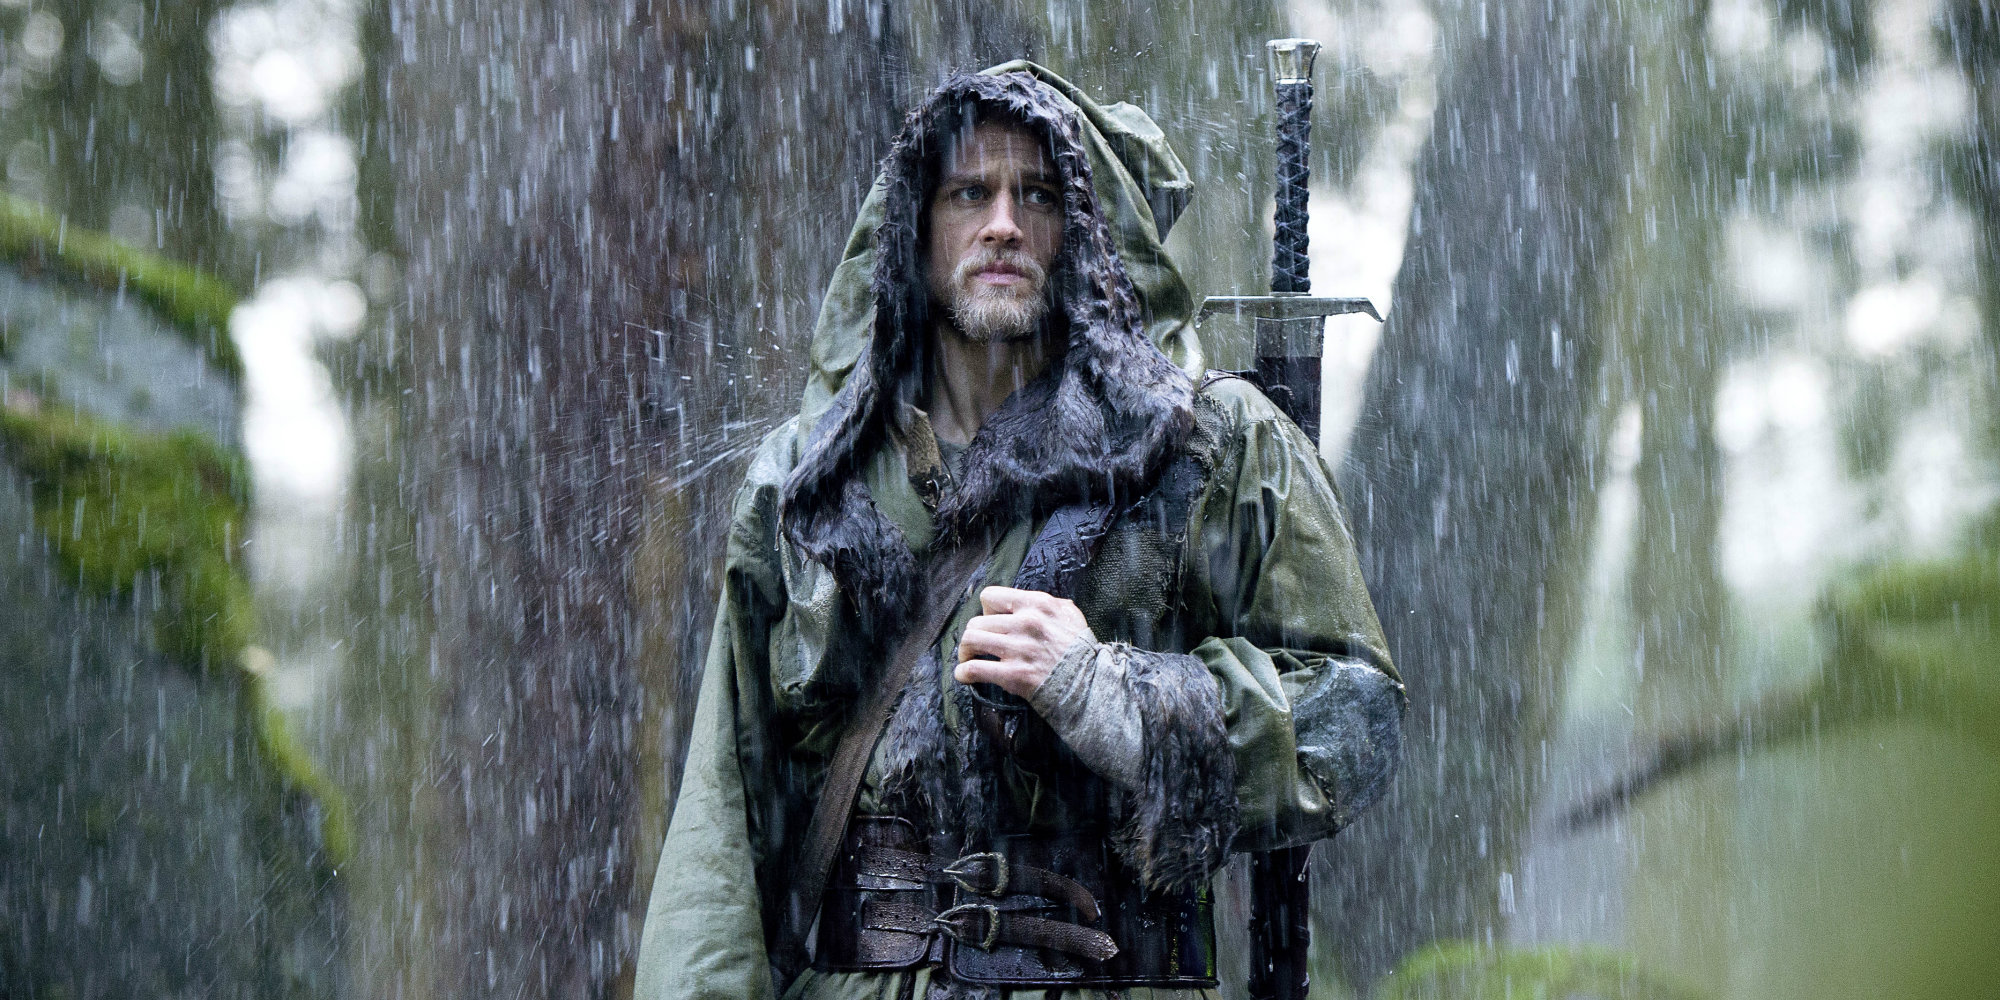 Charlie-Hunnam-in-King-Arthur-Legend-of-the-Sword